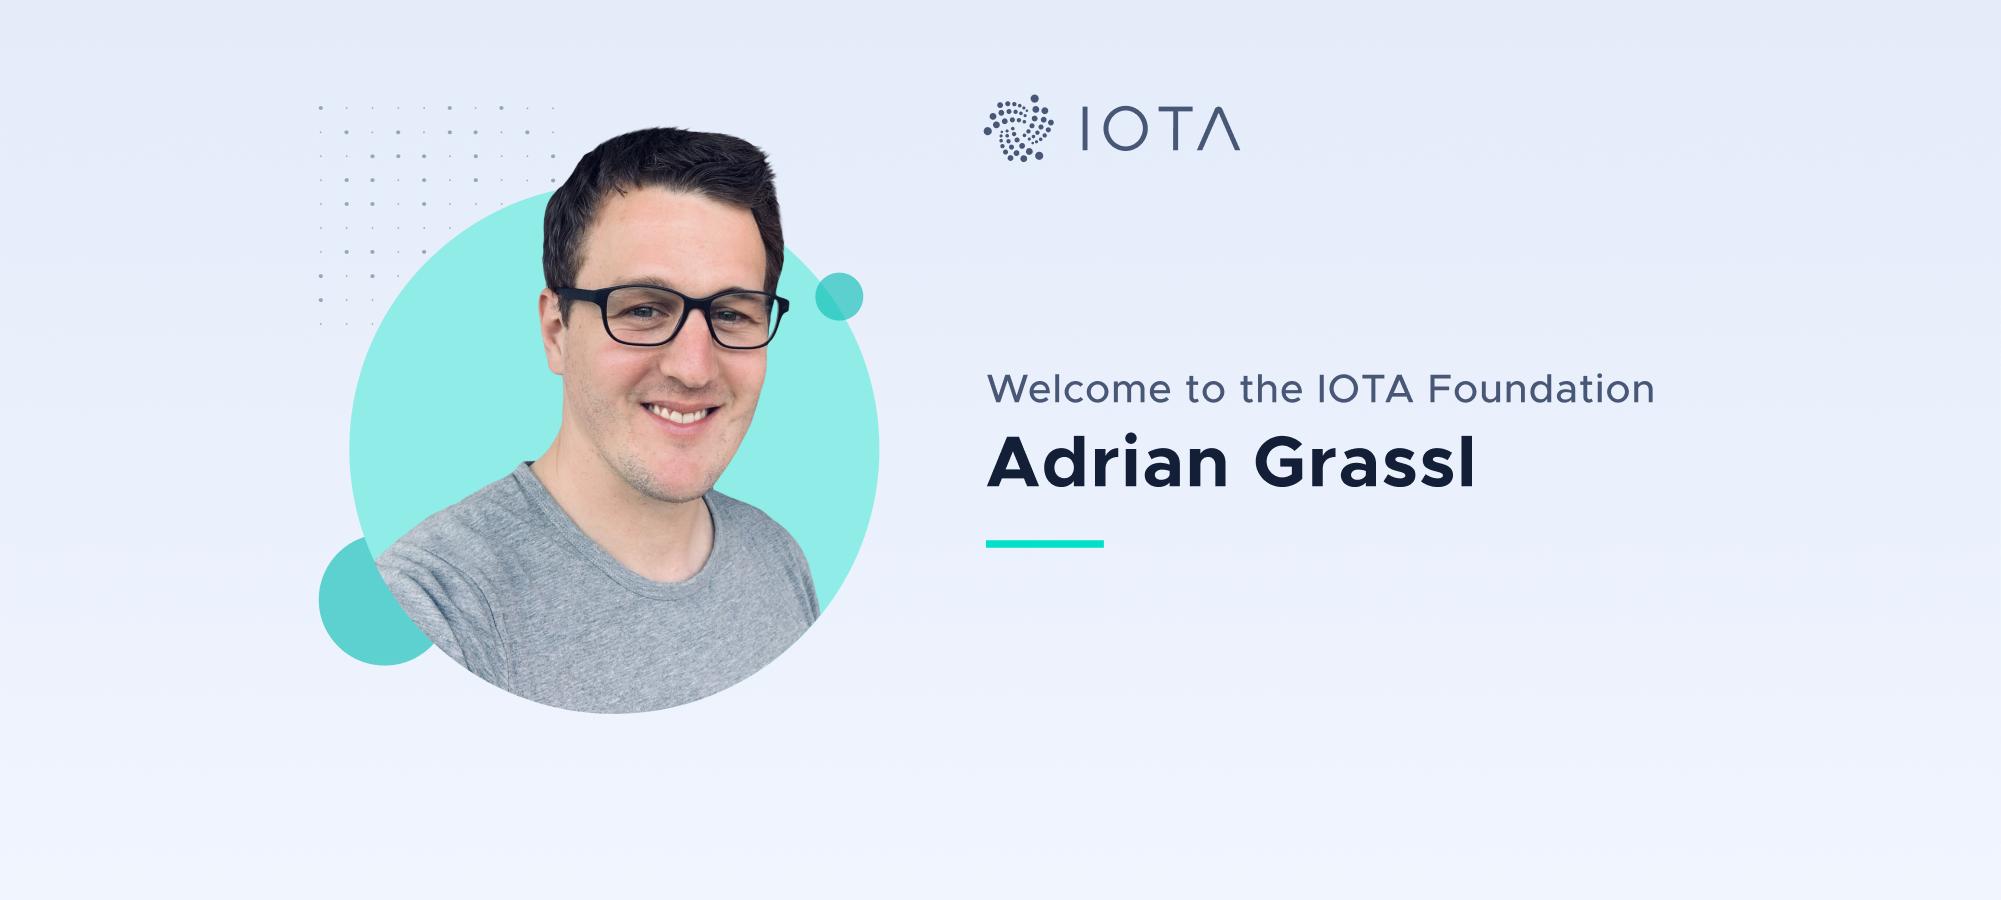 Welcome Adrian Grassl to the IOTA Foundation